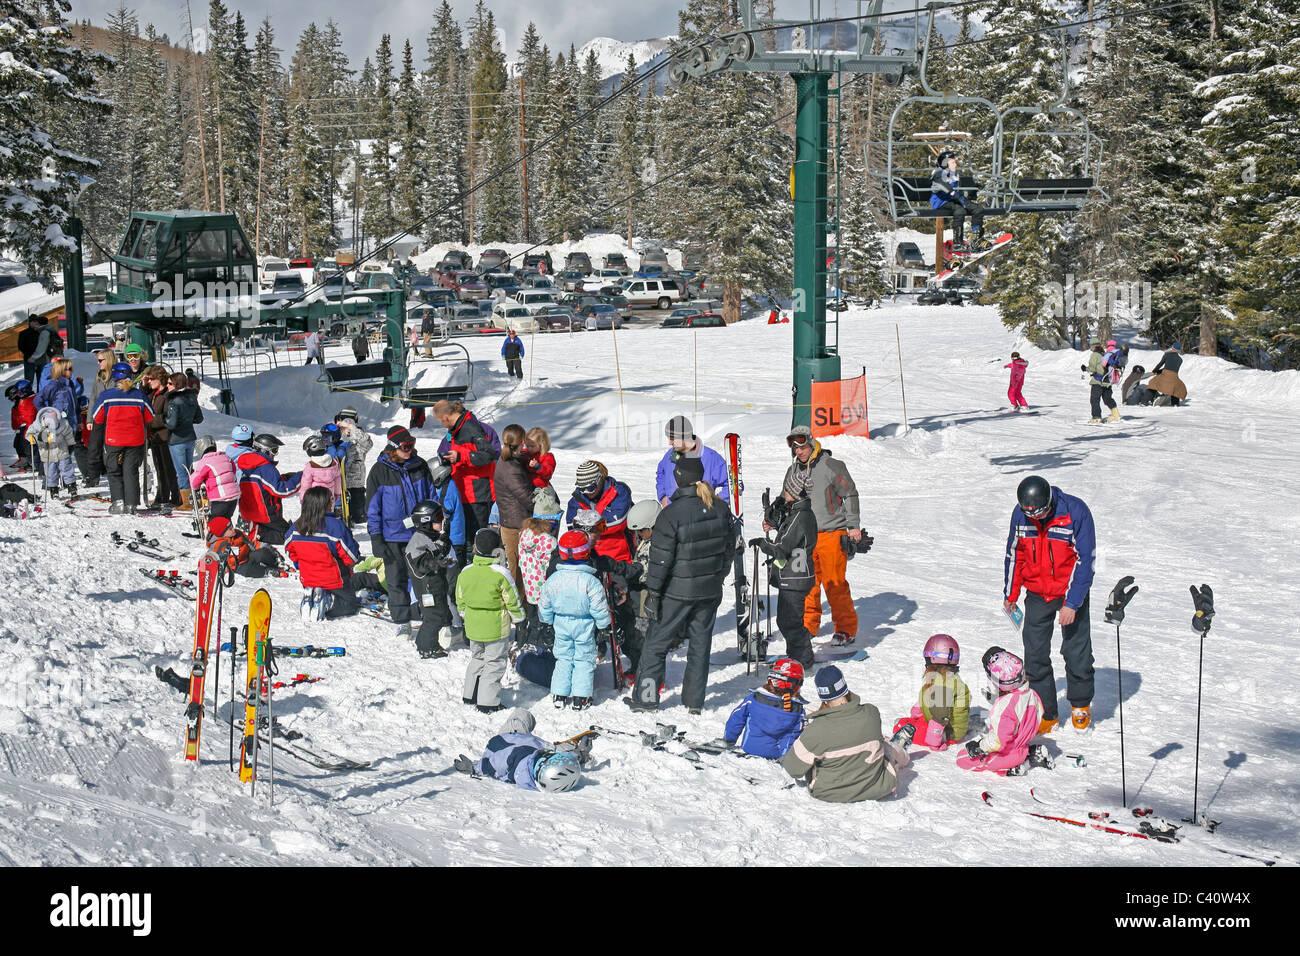 brighton ski resort stock photos & brighton ski resort stock images